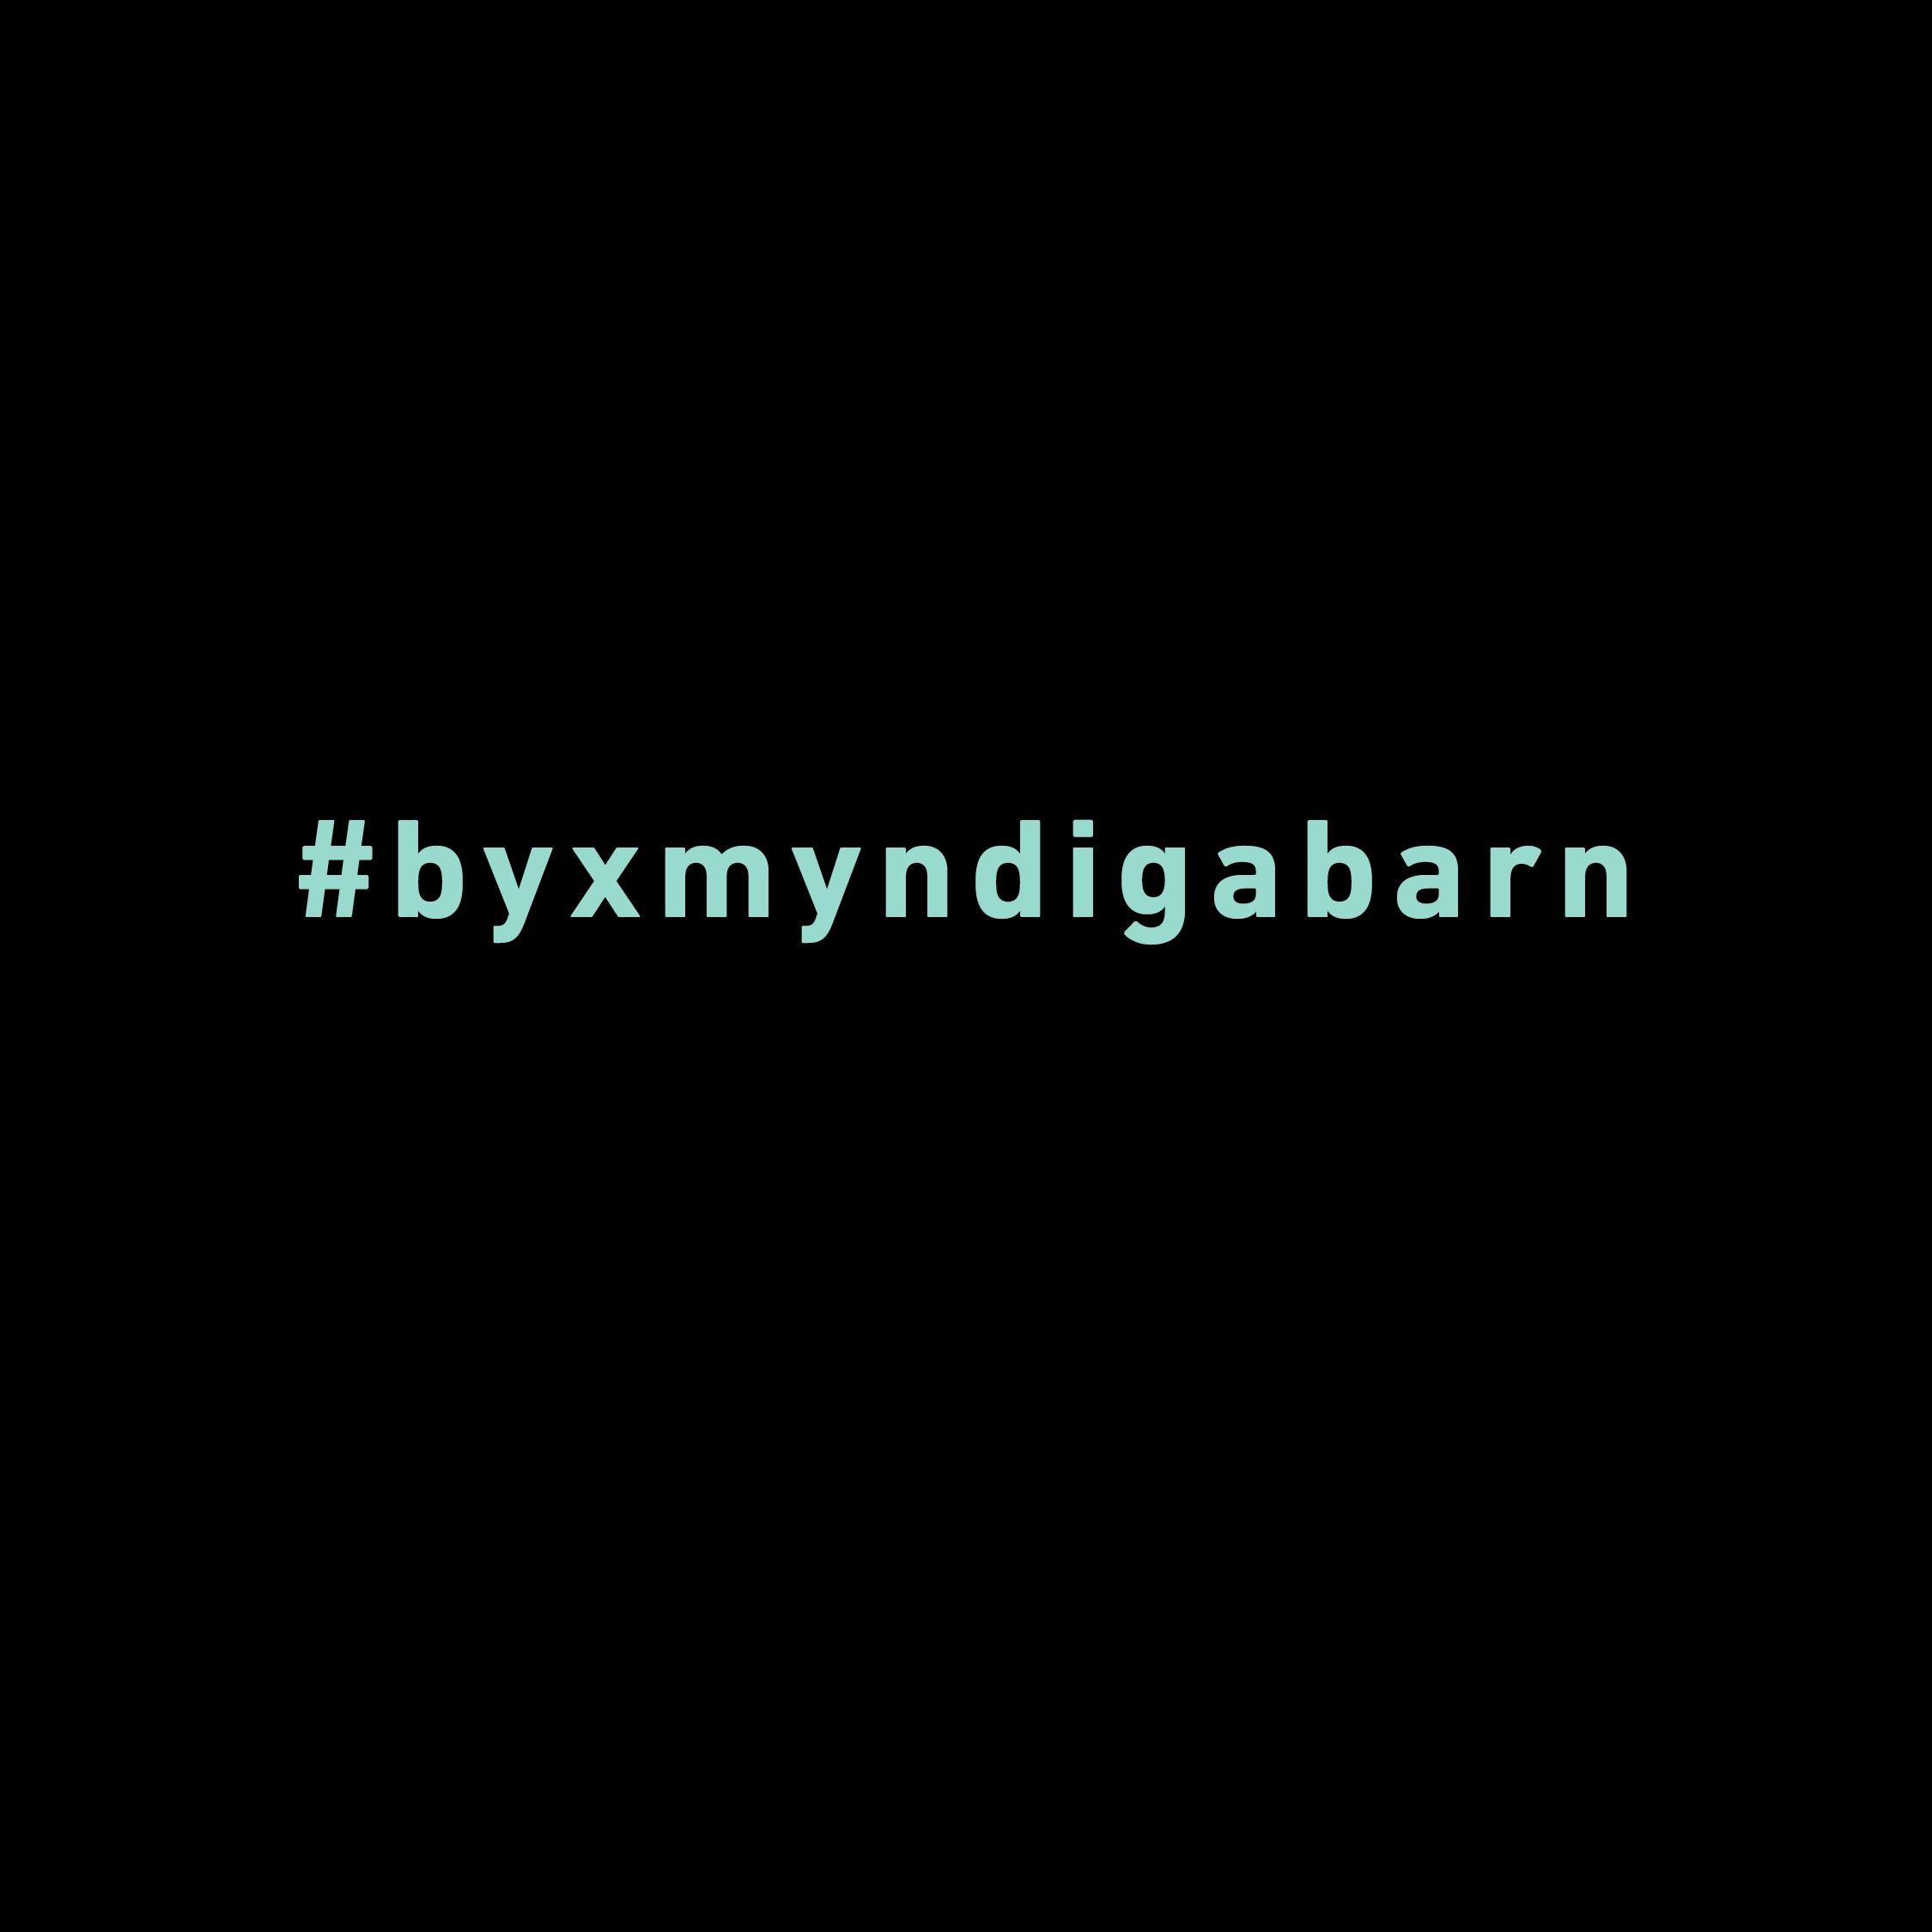 Hashtag #byxmyndiga skriven i grönturkost mot svart bakgrund.